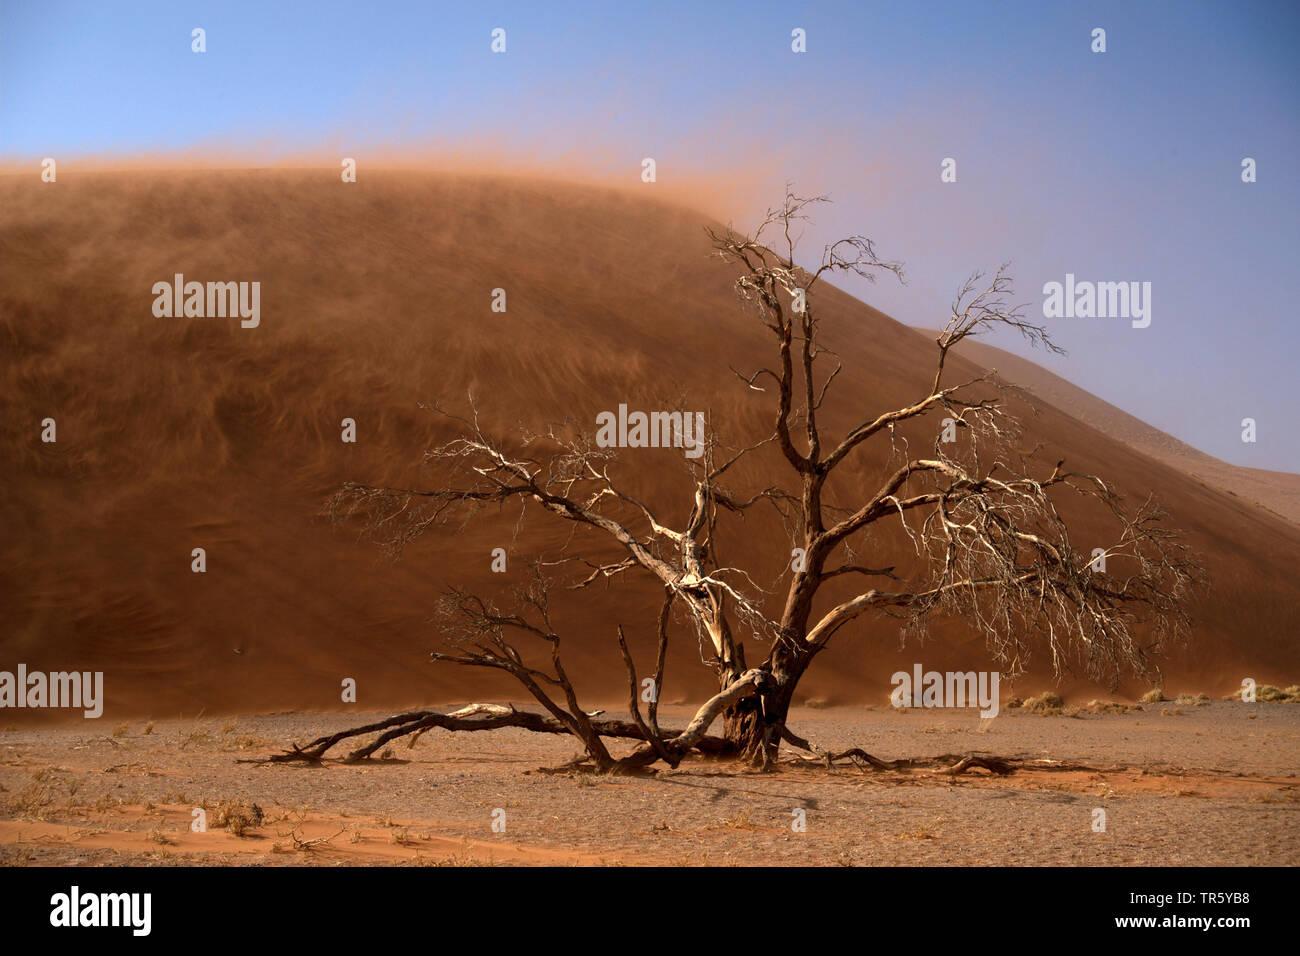 Camel thorn, giraffe thorn (Acacia erioloba), albero morto nella parte anteriore di una duna di sabbia, Namibia, Sossusvlei, Namib Naukluft National Park Foto Stock